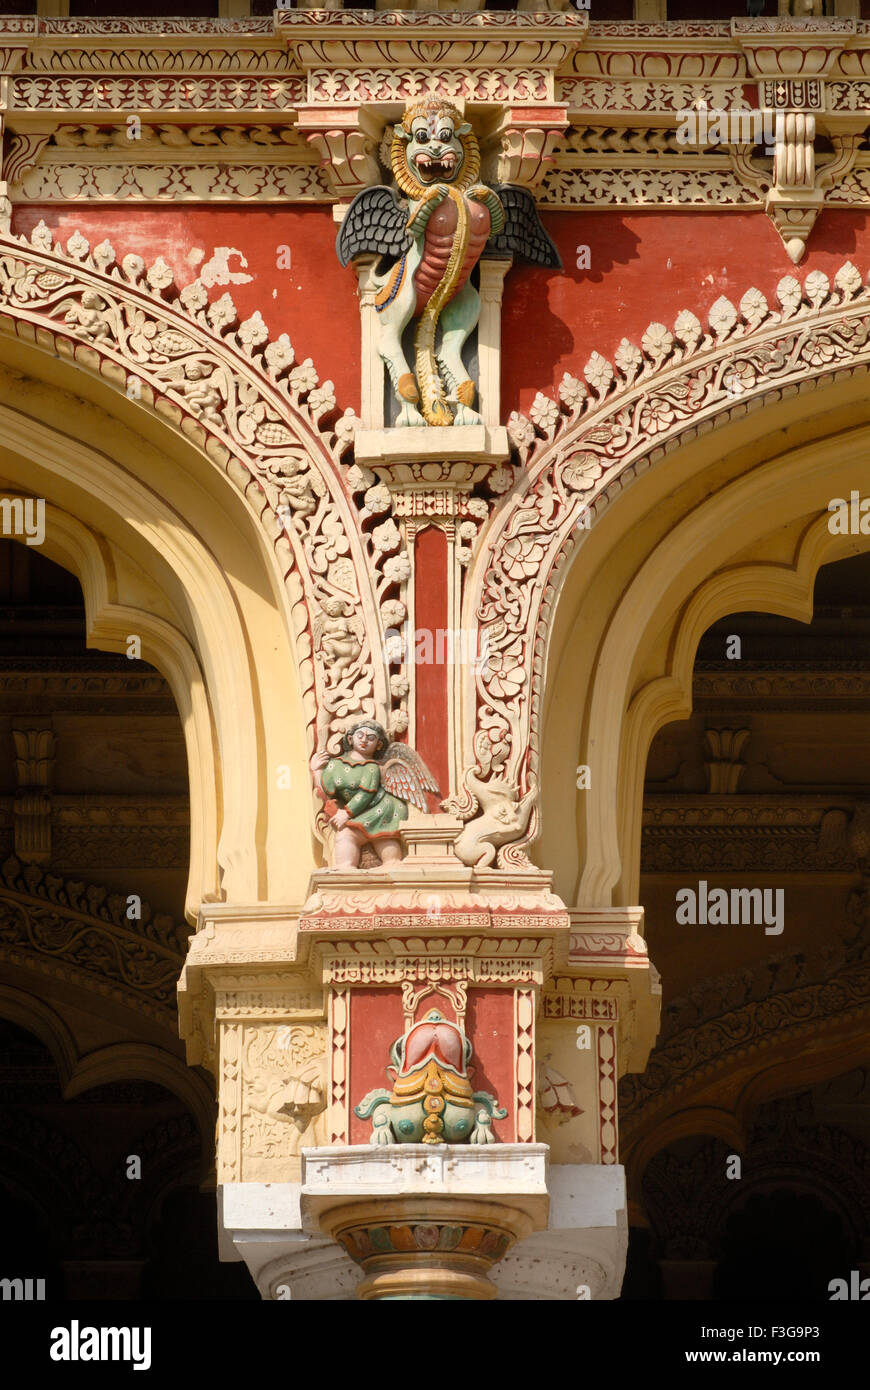 Close view of splendid stucco work at Thirumalai Nayak palace Indo Saracenic style at Madurai ; Tamil Nadu - Stock Image